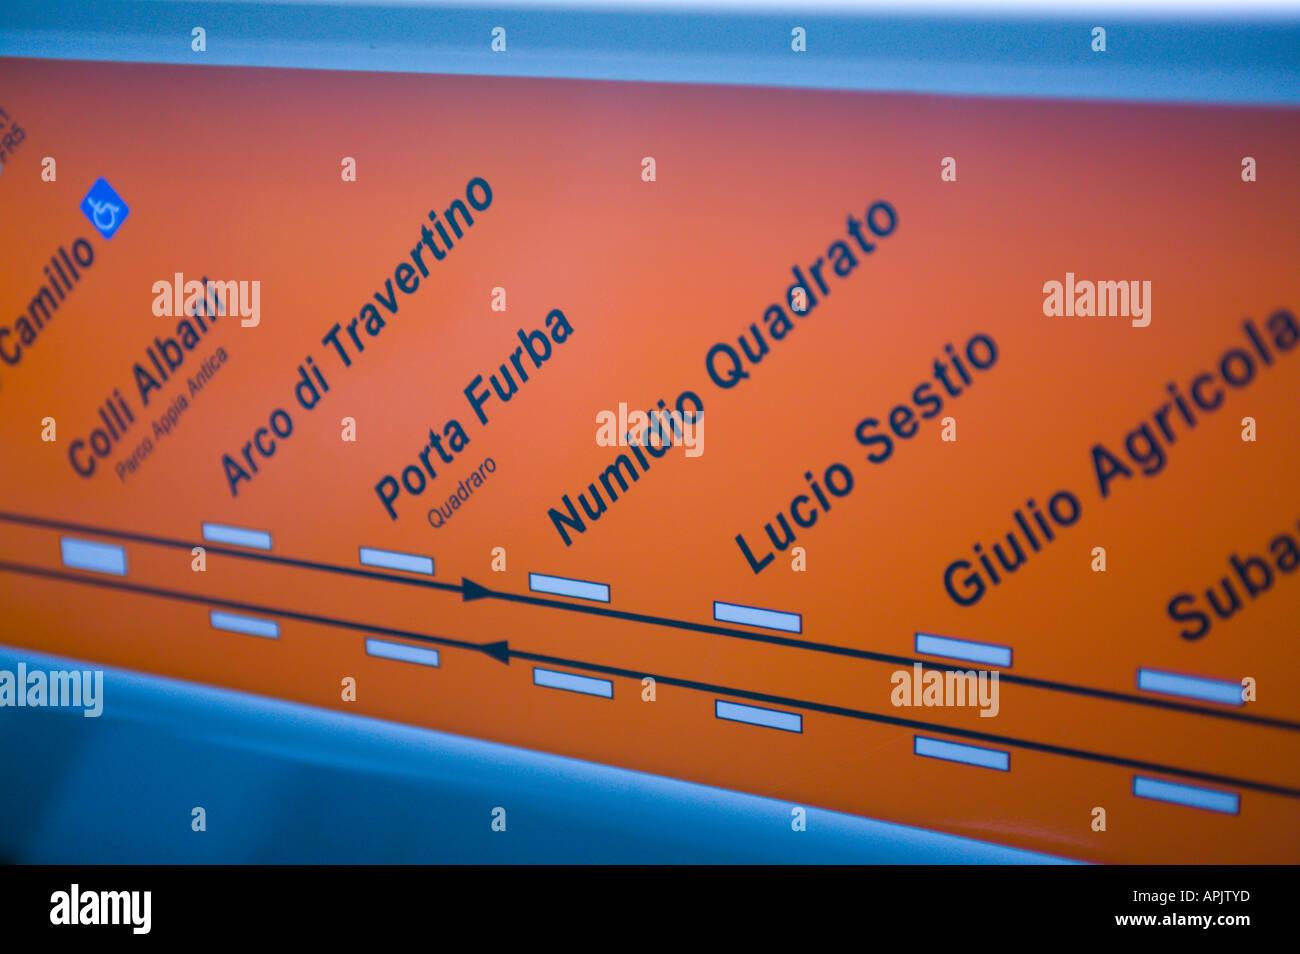 Rome Italy Subway Map.Subway Map Rome Italy Stock Photo 9032892 Alamy